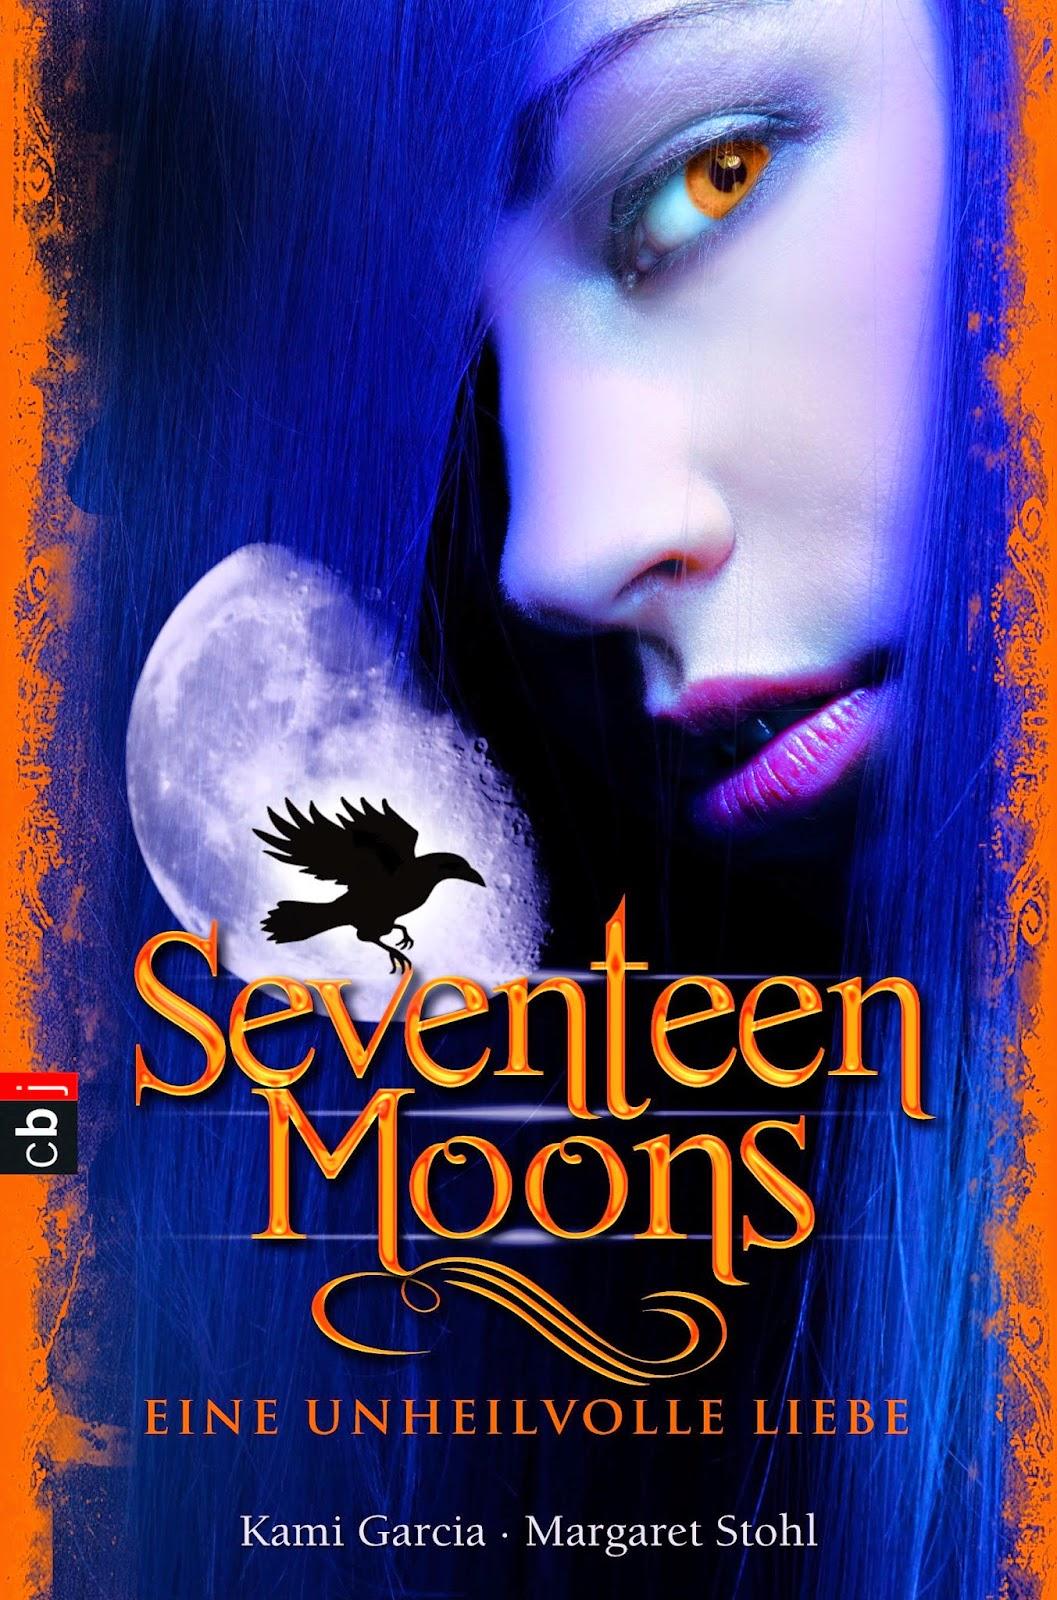 http://www.amazon.de/Seventeen-Moons-Eine-unheilvolle-Liebe/dp/3570138291/ref=tmm_hrd_title_0?ie=UTF8&qid=1399123460&sr=8-1